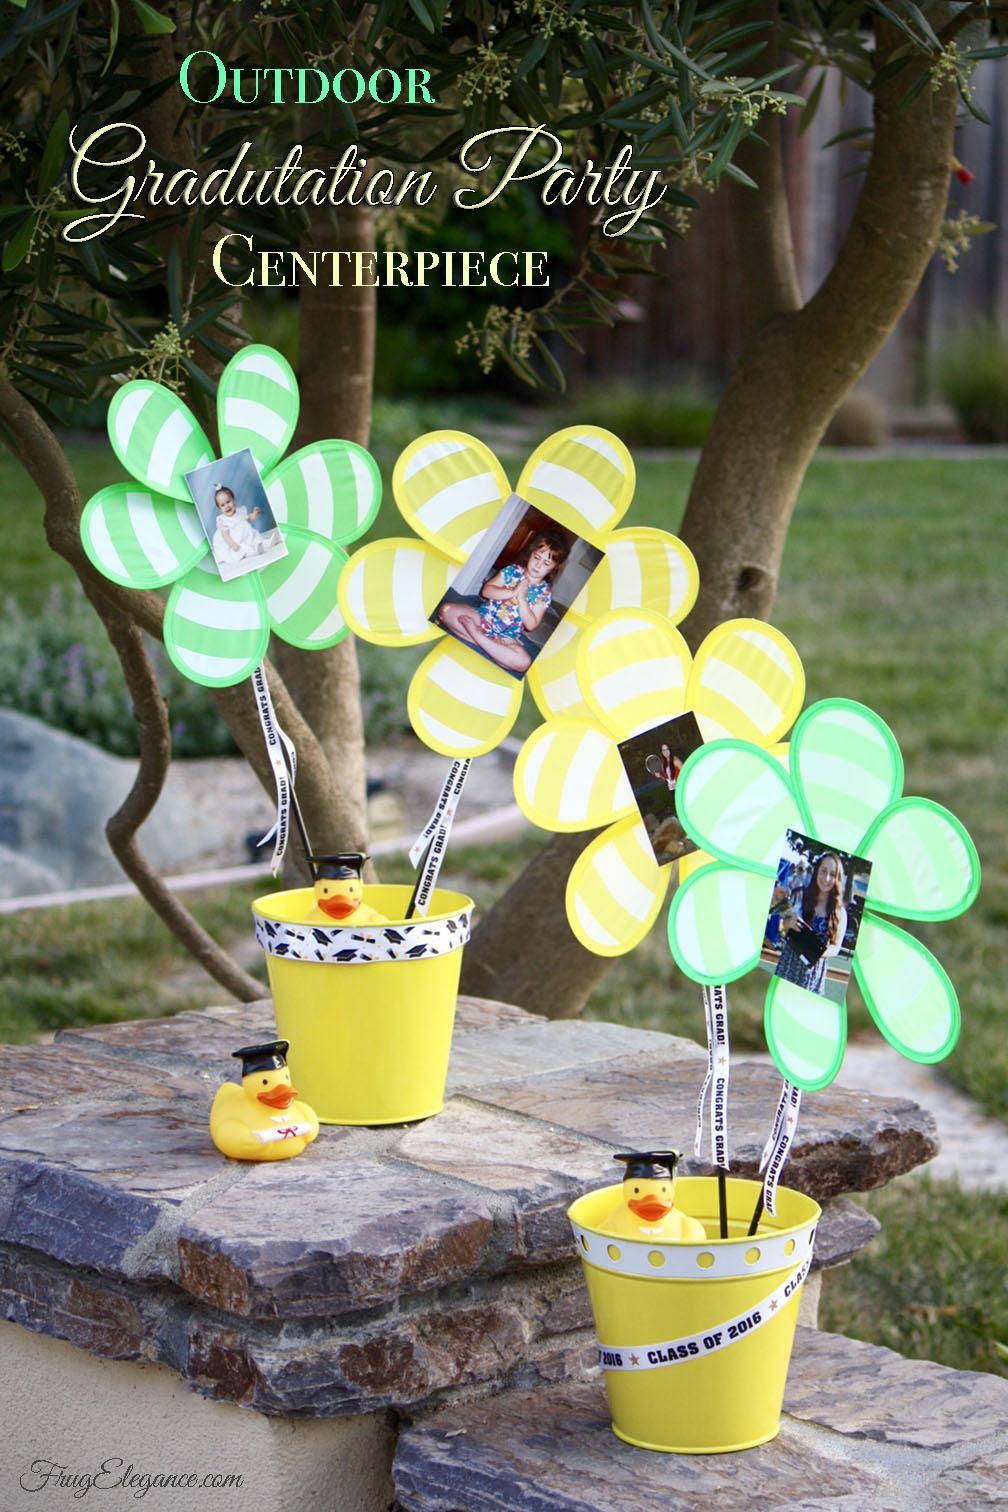 Outdoor Graduation Party Centerpiece - FrugElegance